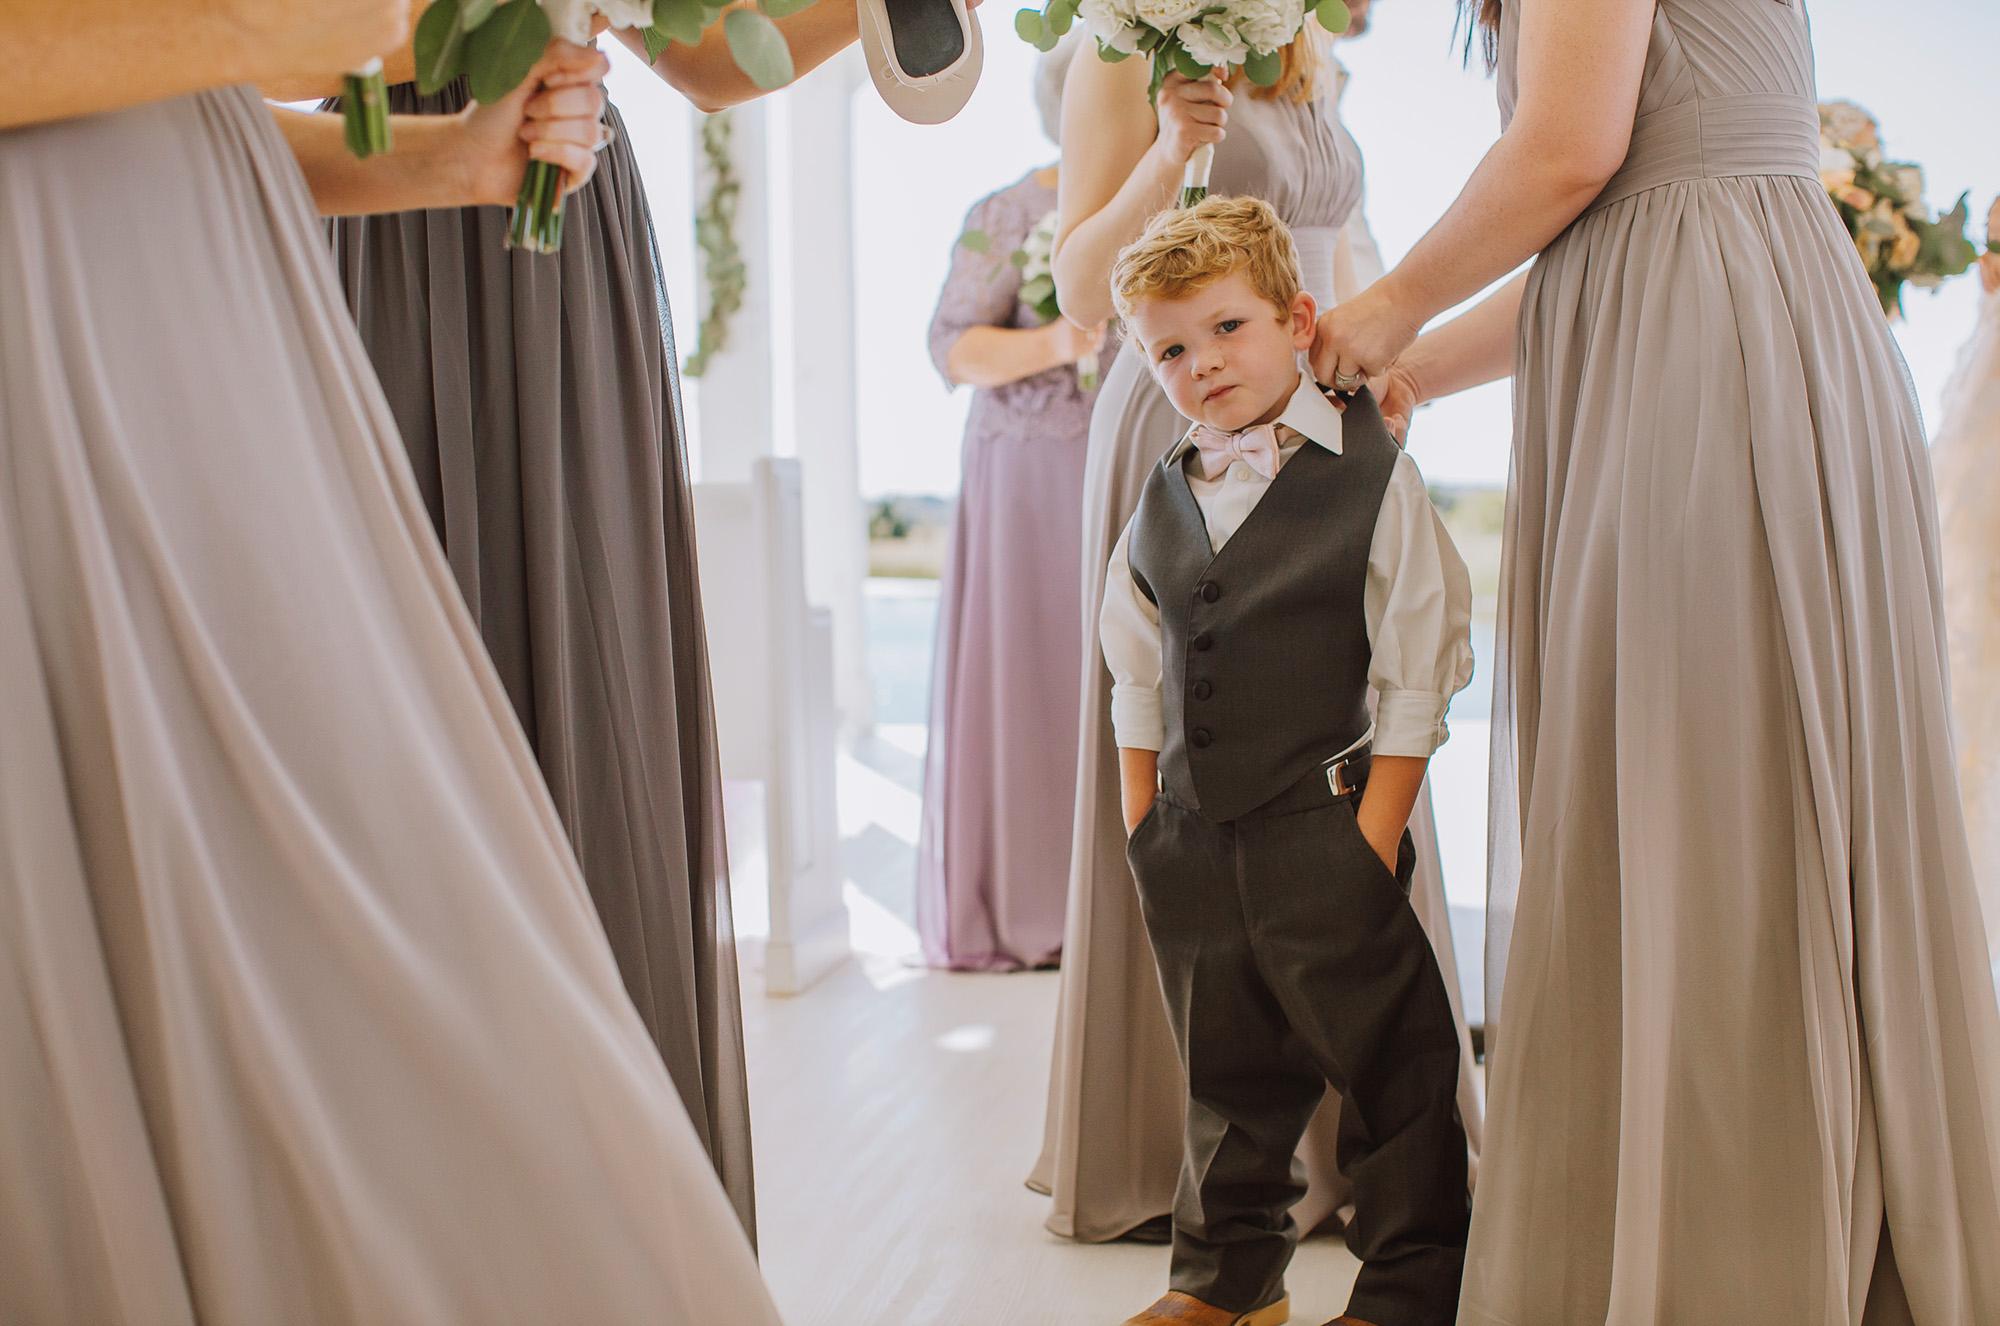 The Grand Ivory Wedding - Leonard, Texas Wedding Venue